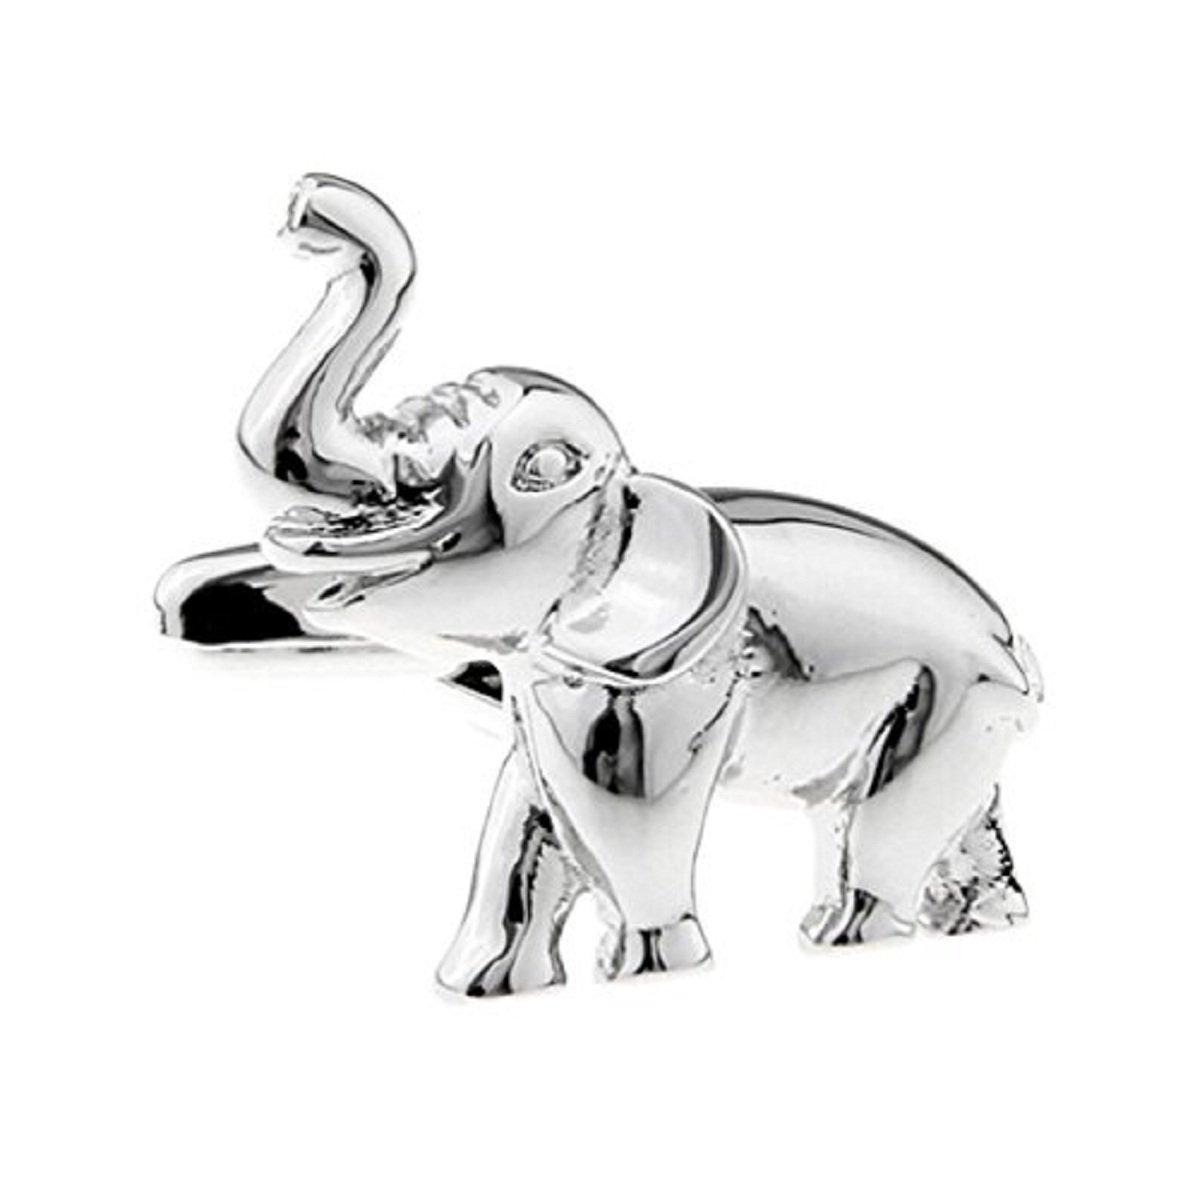 Hosaire Cufflinks Men's Fashion Silver Elephant Cuff Link Novelity Cuff-link